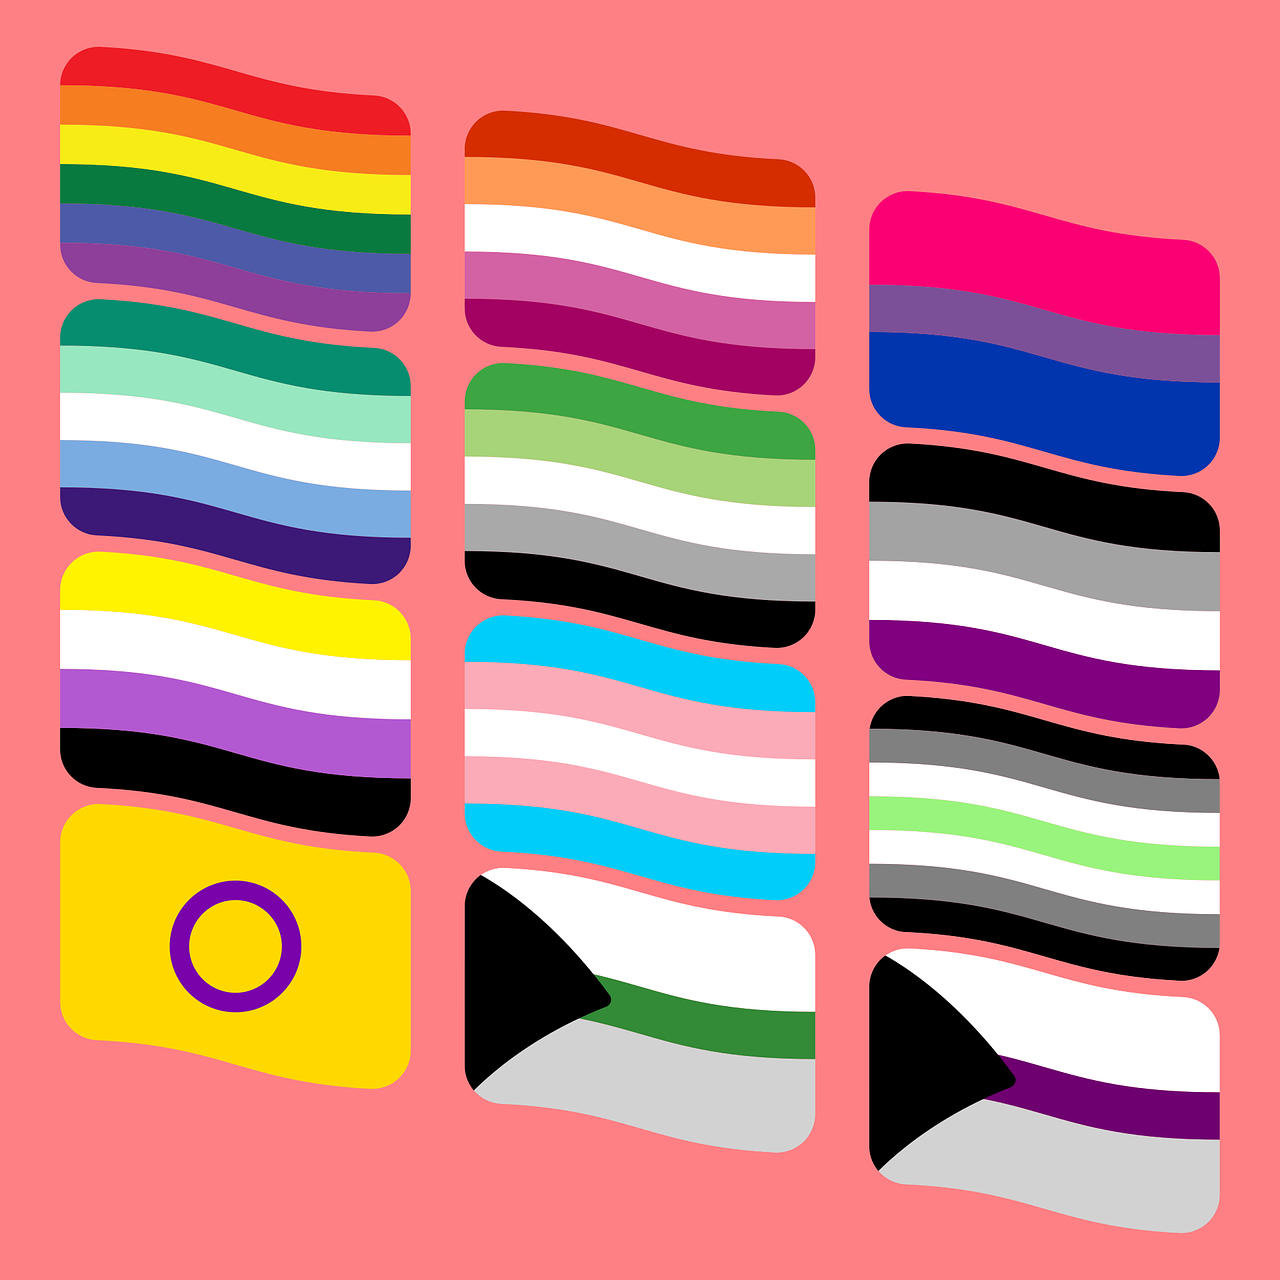 Lgbt Flaggen Symbole - Kostenlose Vektorgrafik auf Pixabay